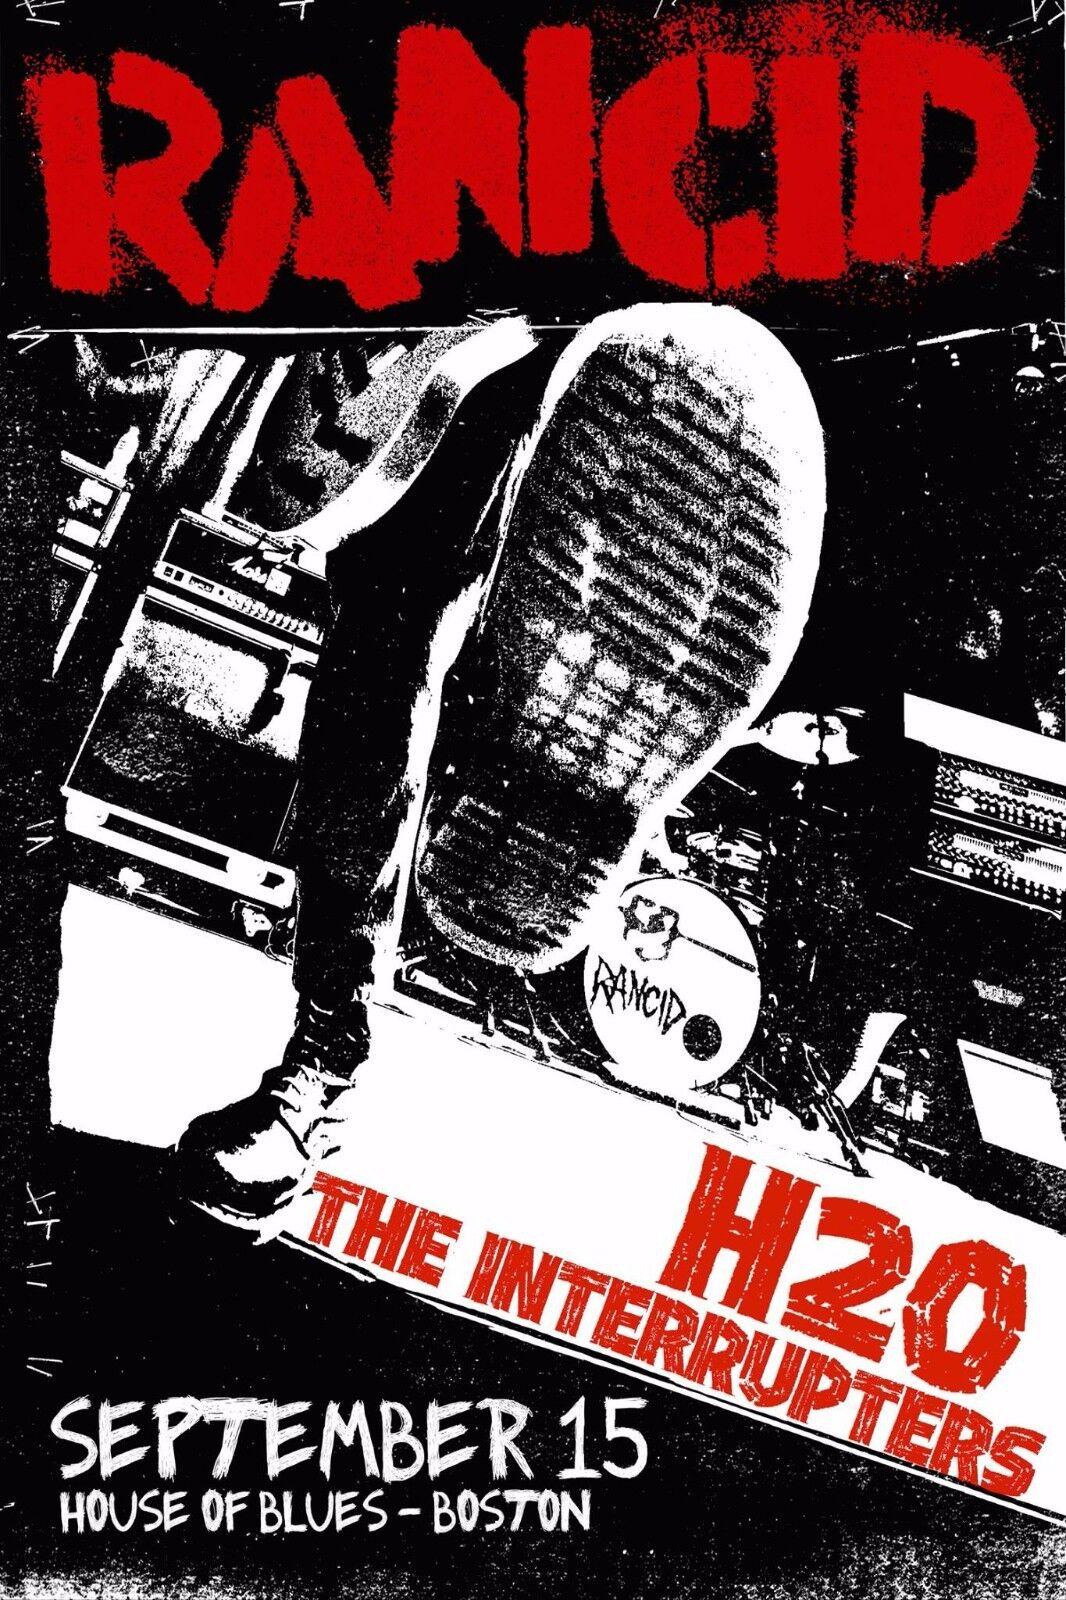 RANCID / H20 / THE INTERRUPTERS 2015 BOSTON CONCERT TOUR POSTER- Punk Rock Music - $11.99